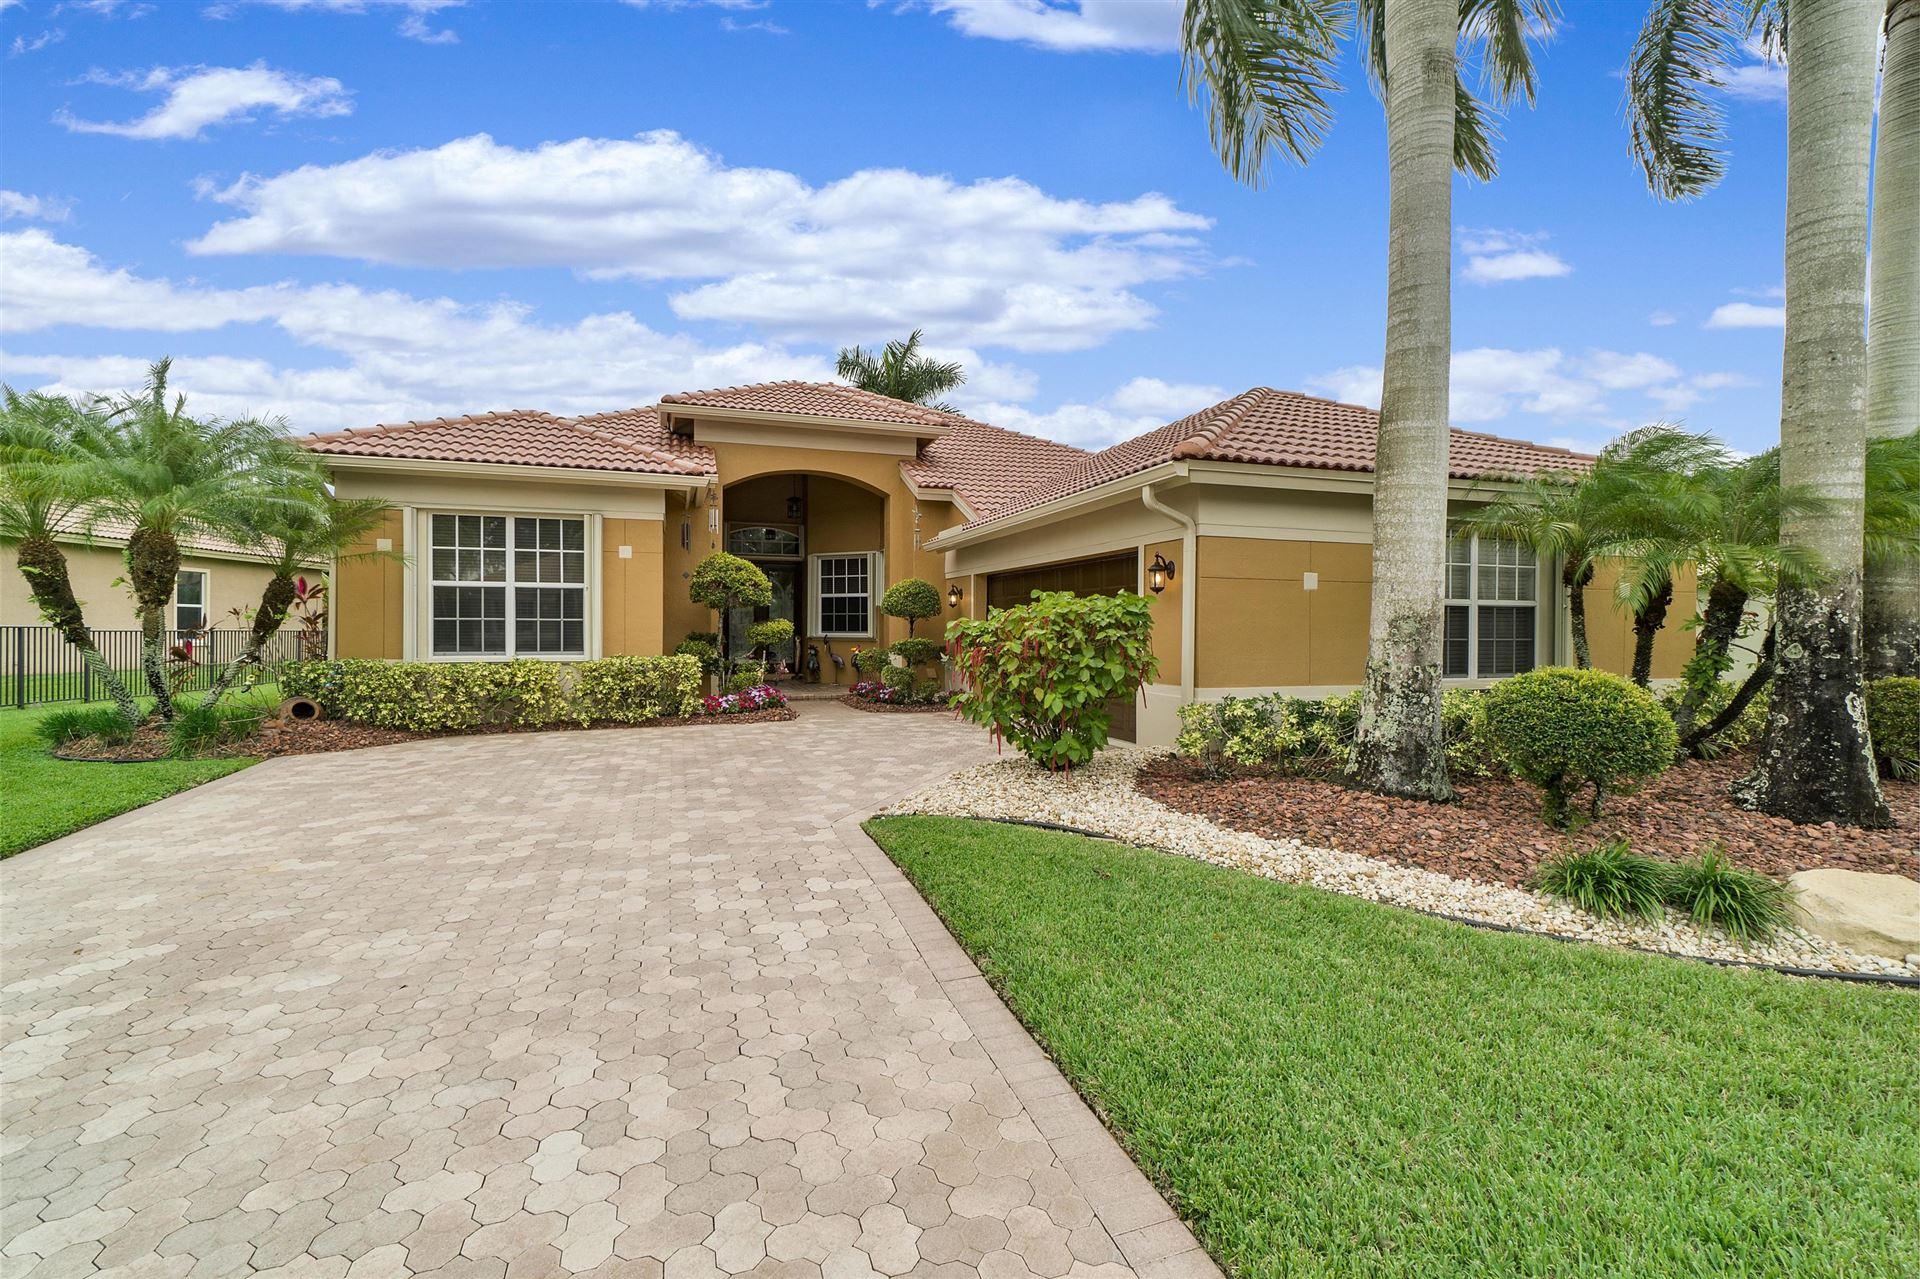 Photo of 6896 NW 113 Avenue, Parkland, FL 33076 (MLS # RX-10668330)